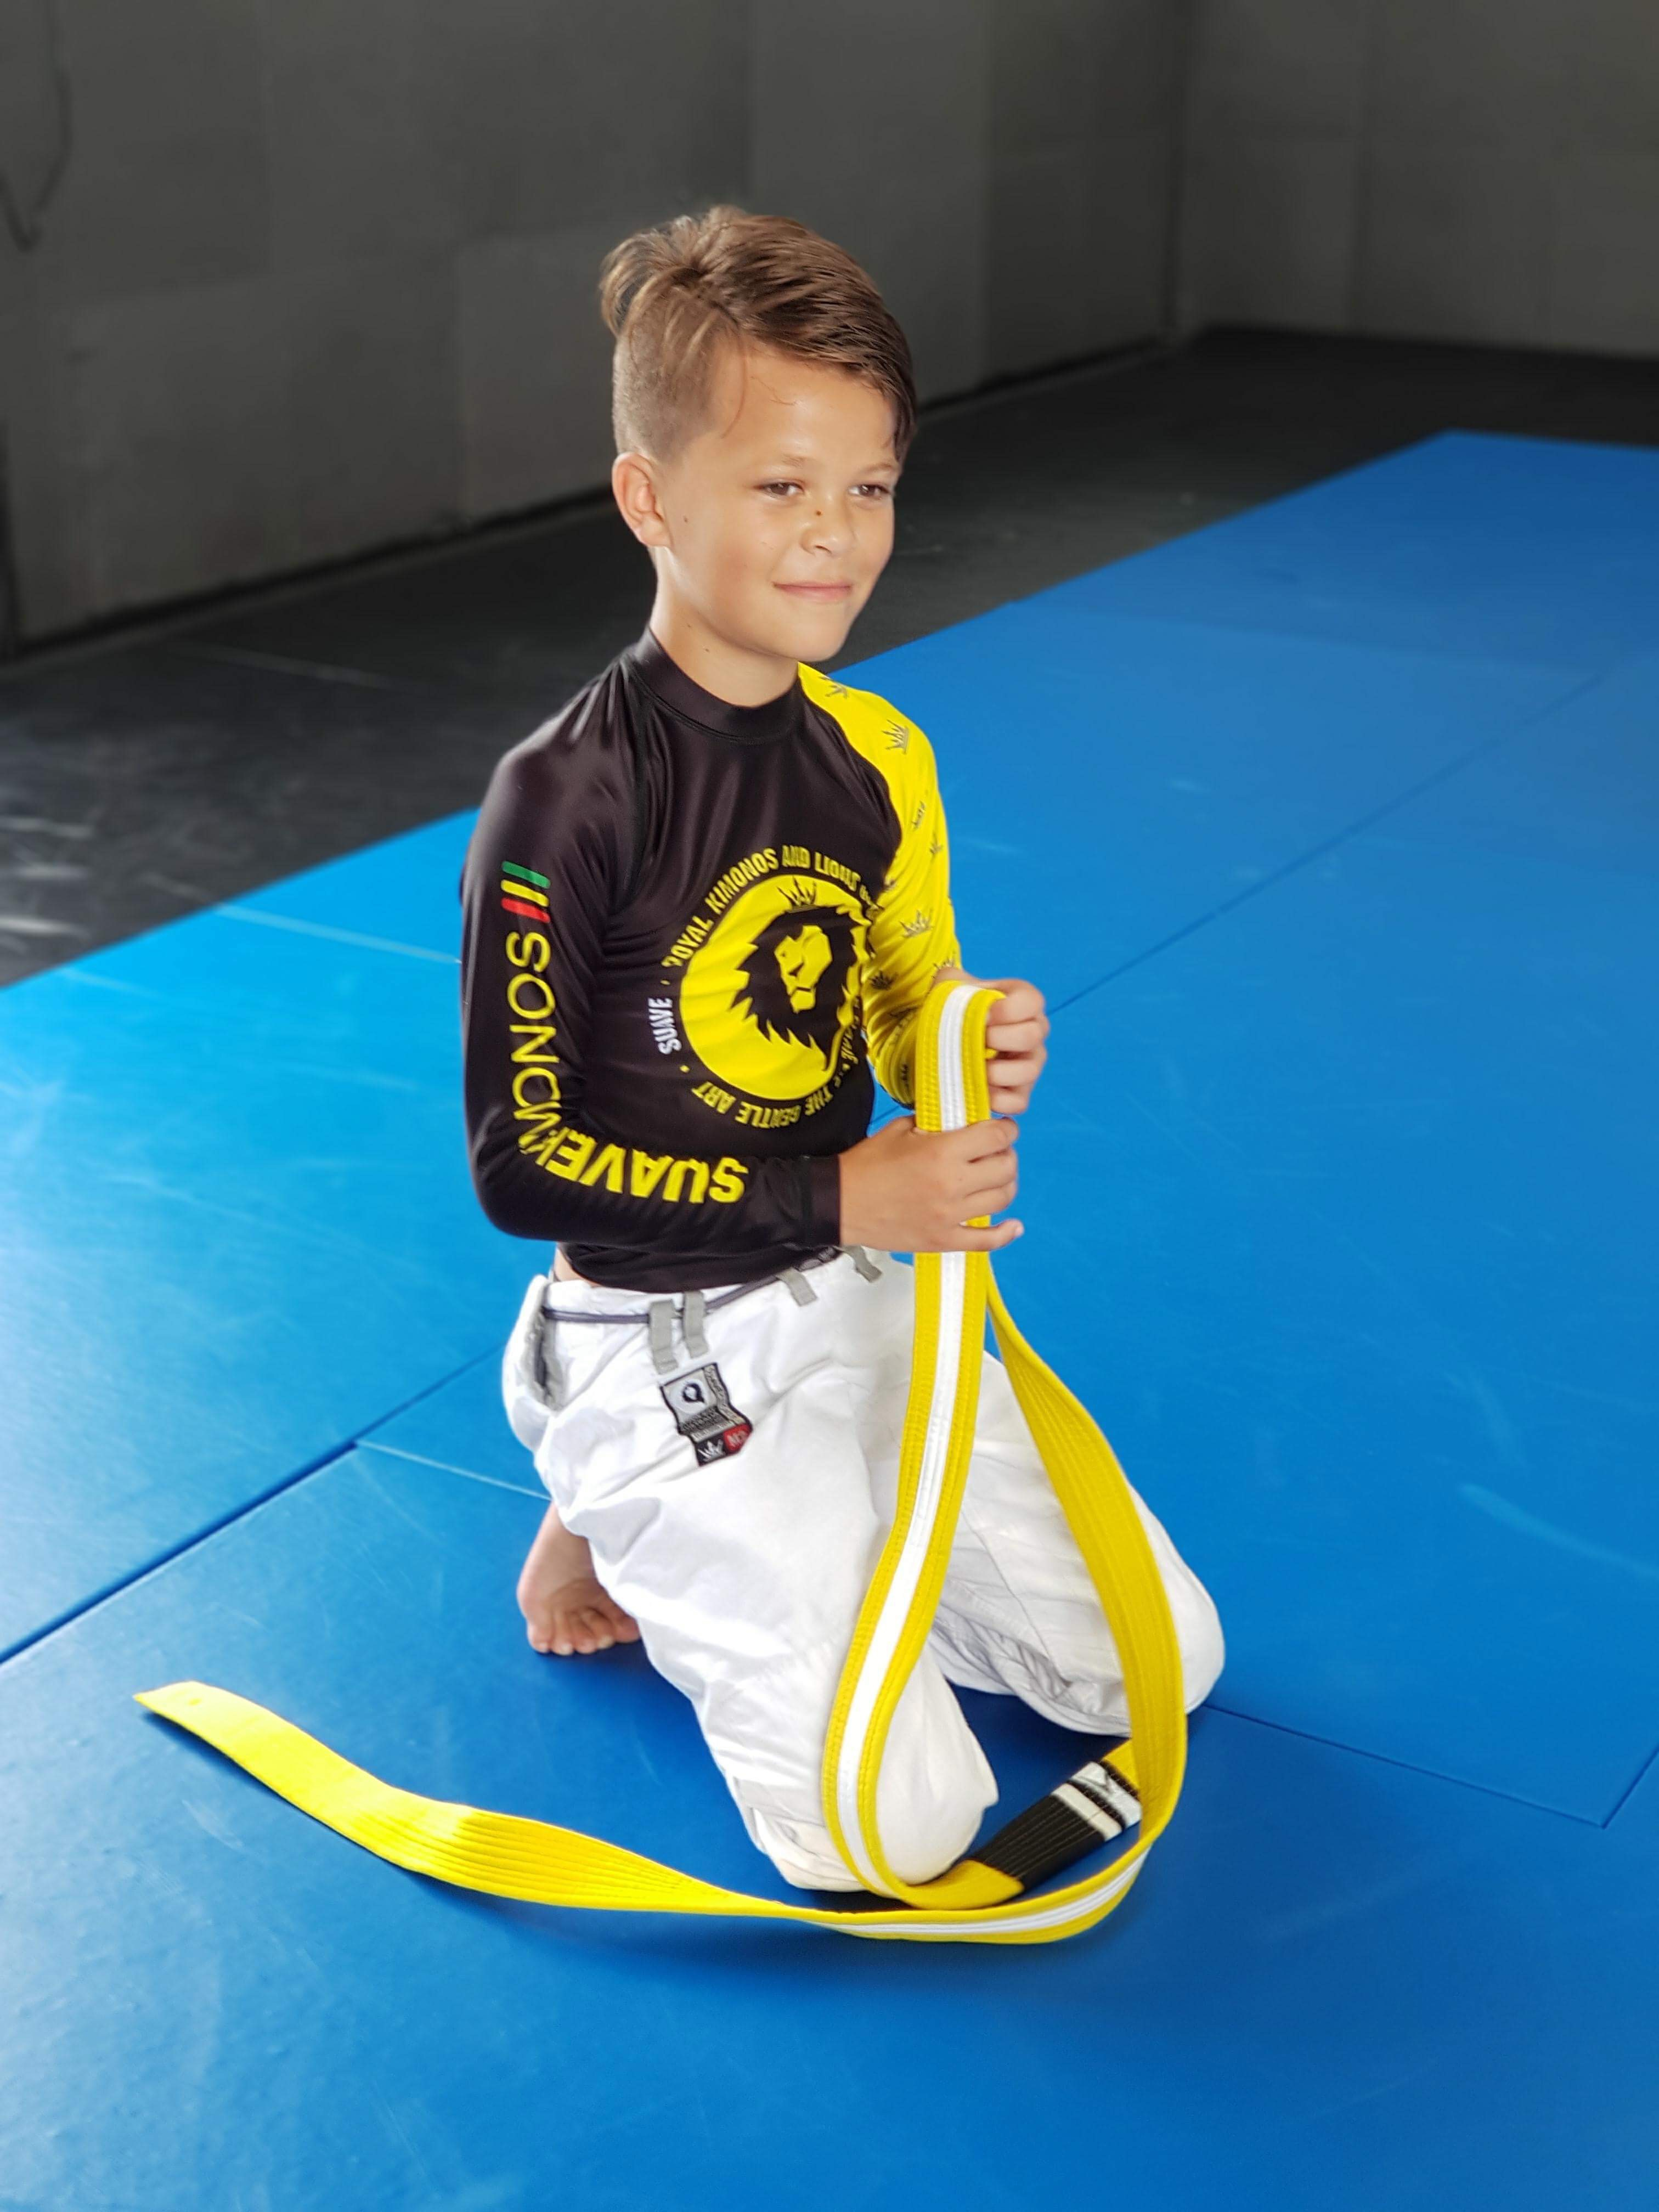 Brazilian Jiu Jitsu: Wise move to focus on one code - NZ Herald